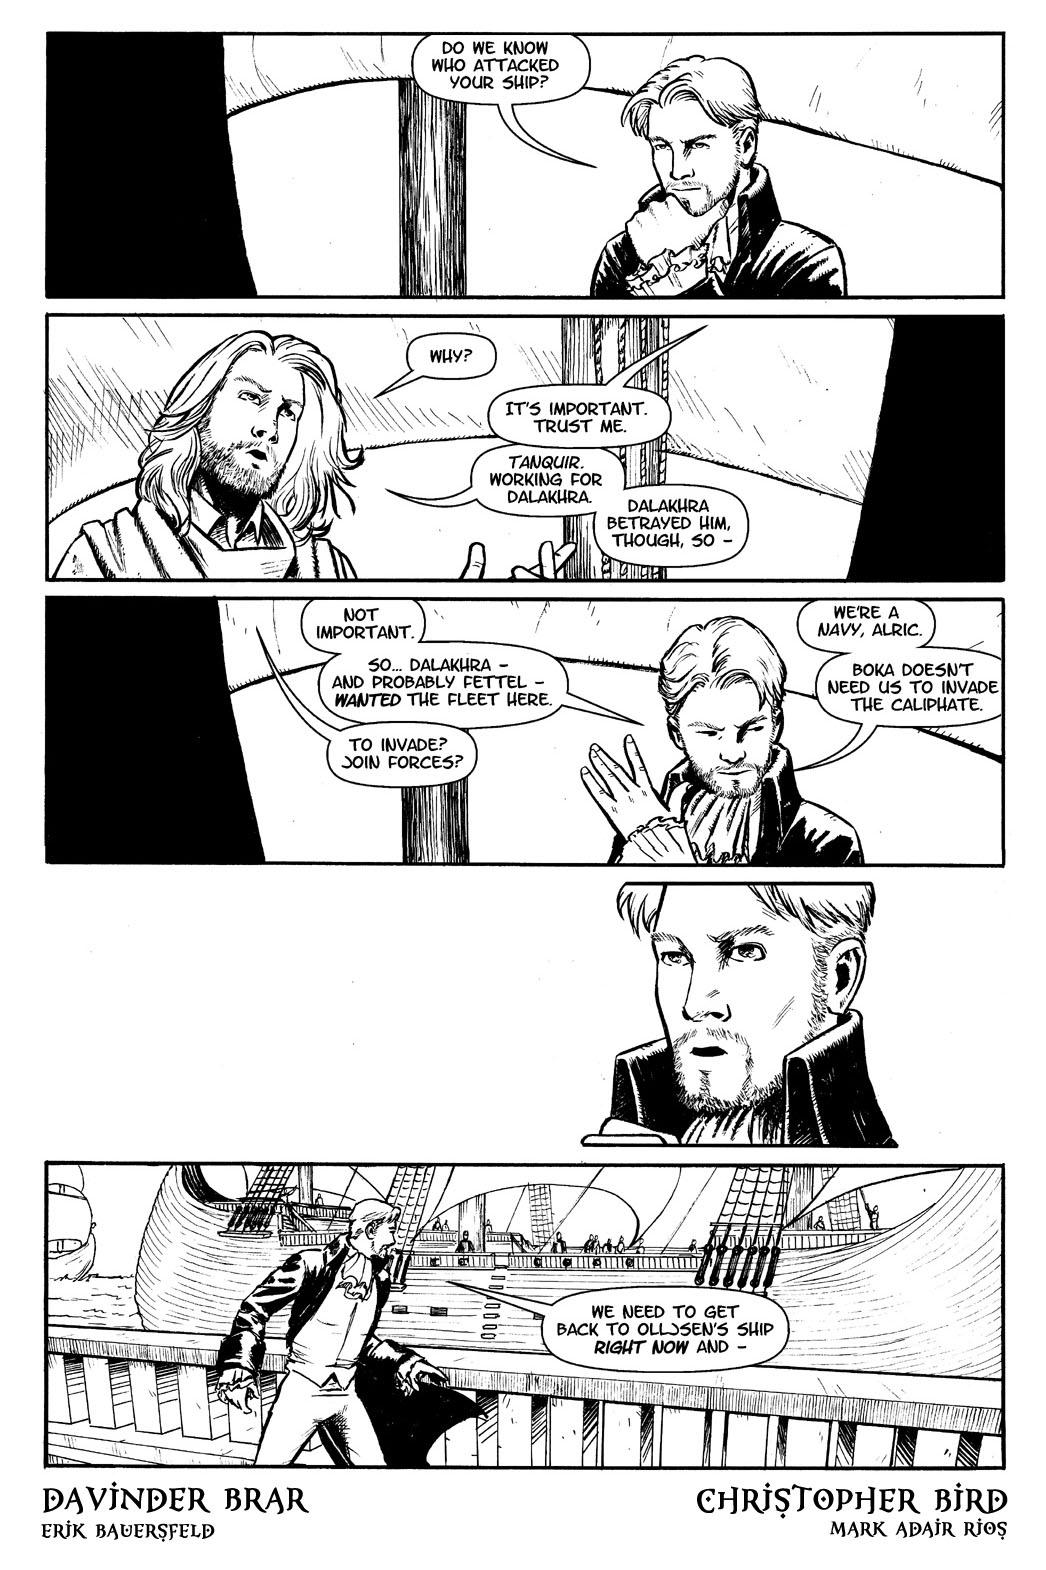 Book Seven, Page Twenty-Seven